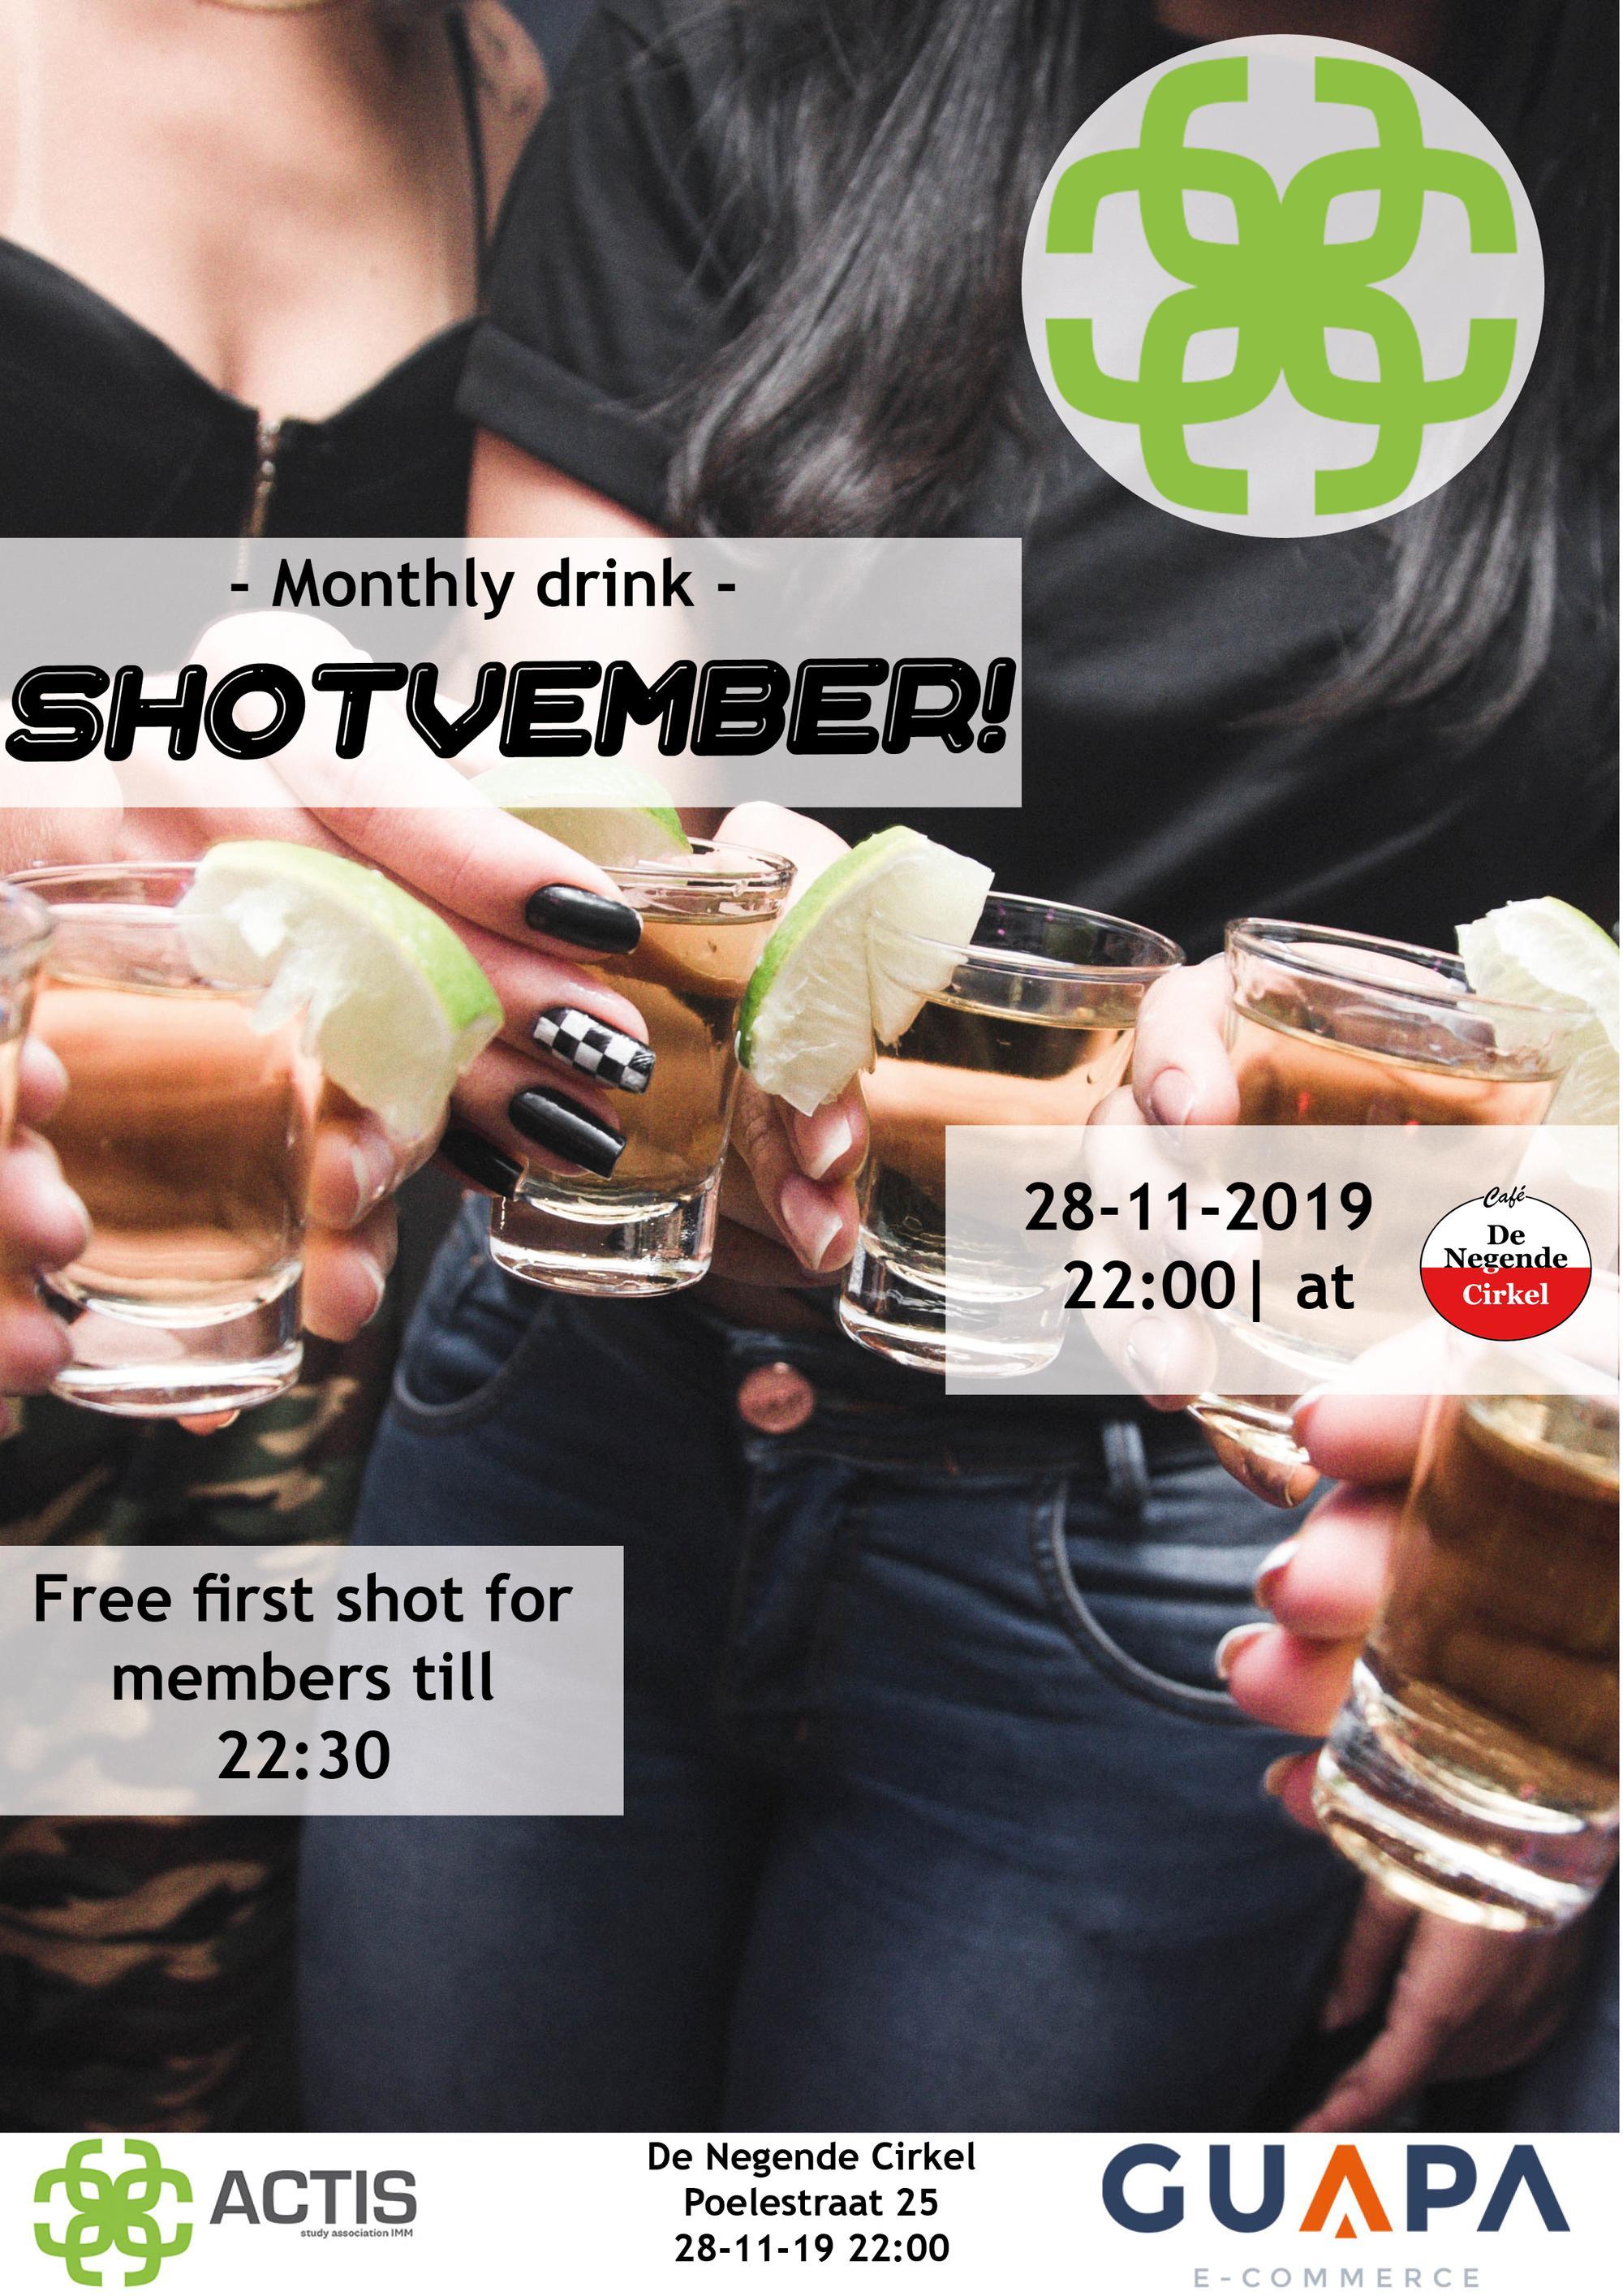 Third monthly drink: Shotvember